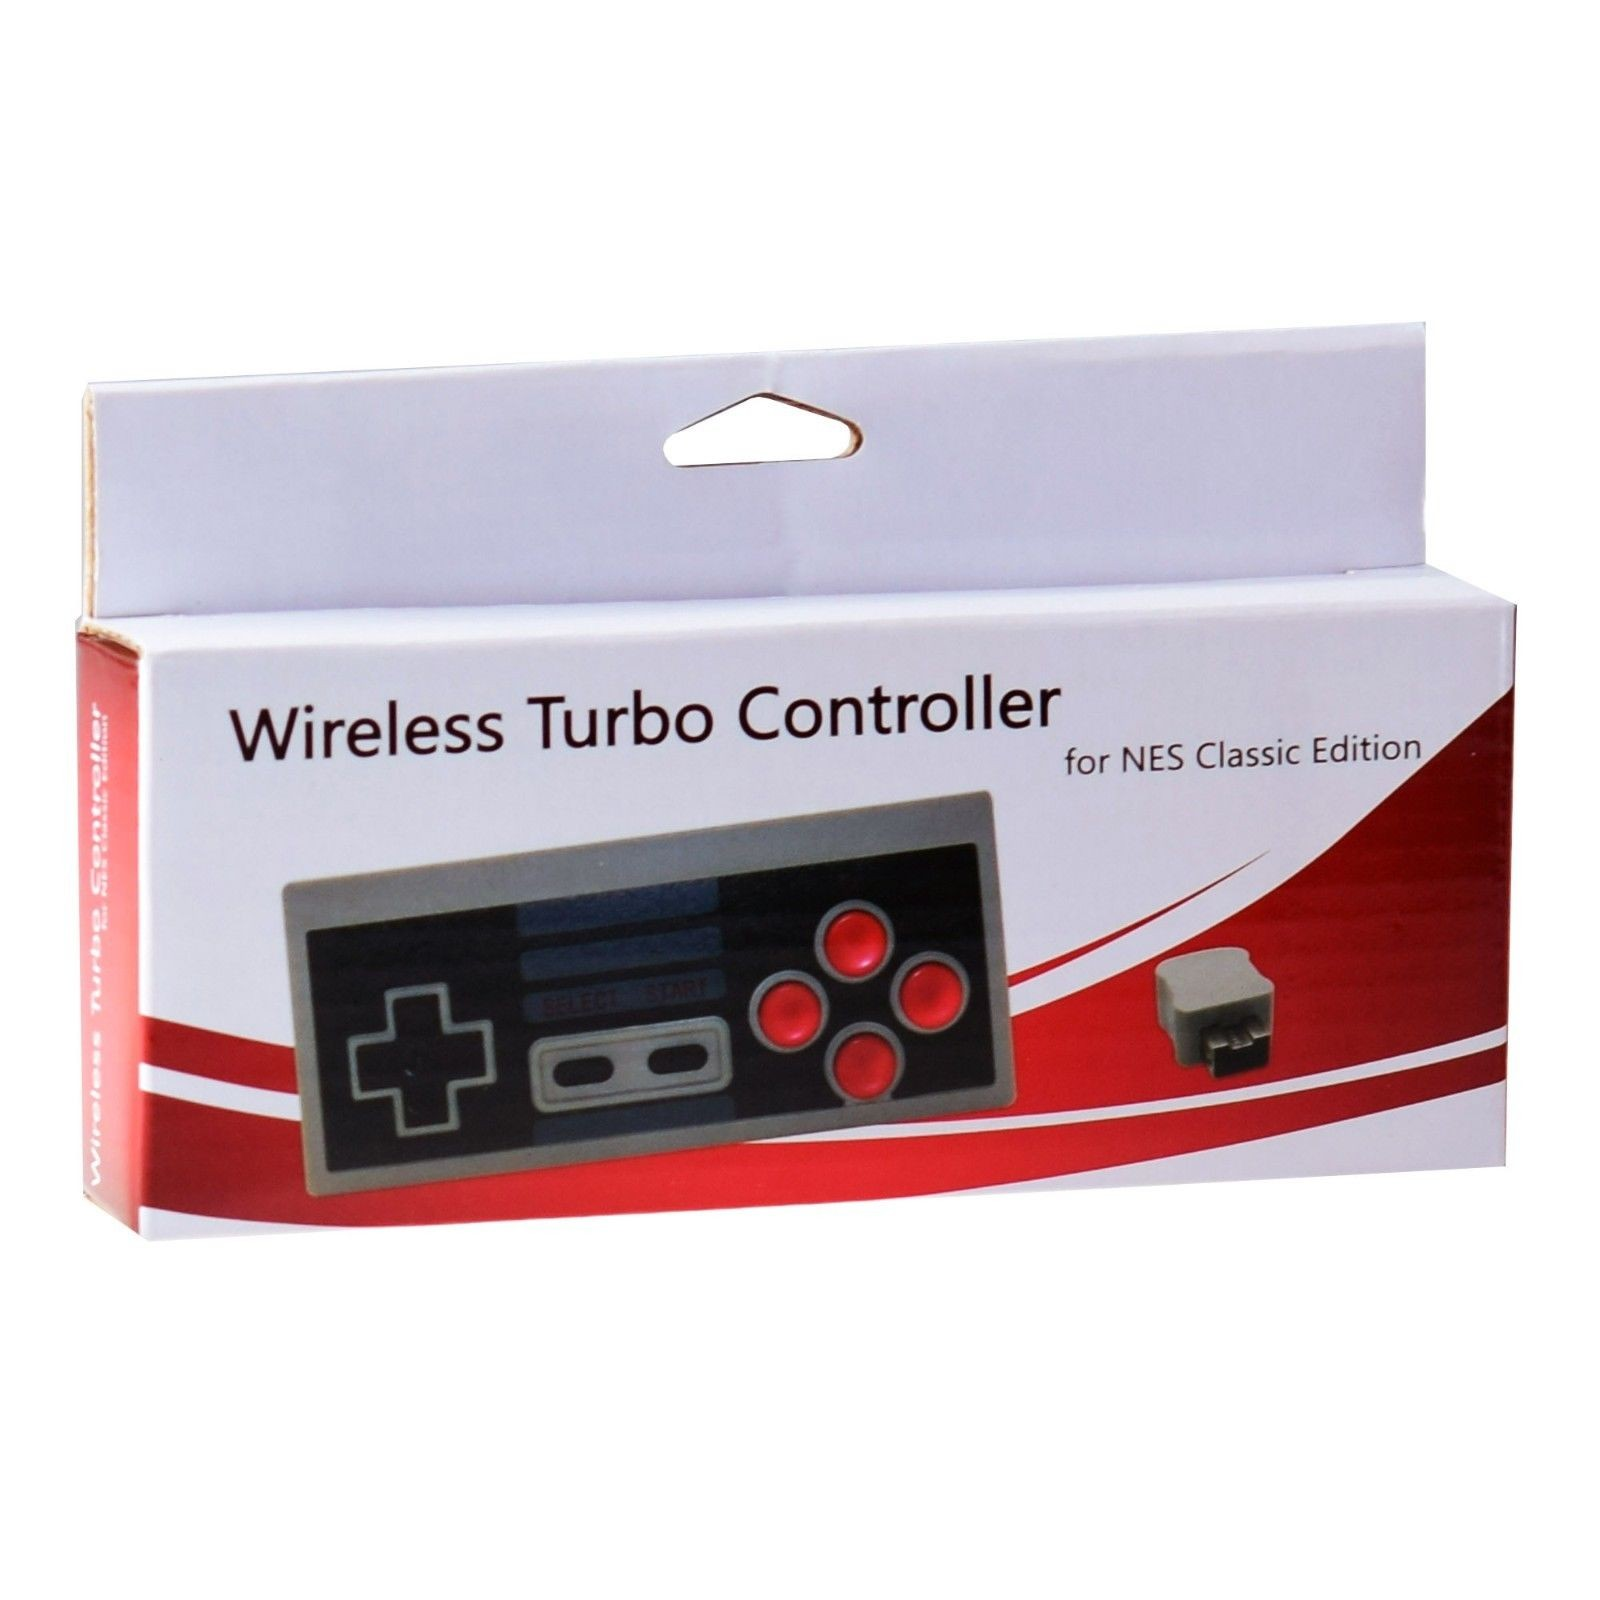 Беспроводной контроллер/джойстик/геймпад Wireless Turbo Controller for NES Classic Edition